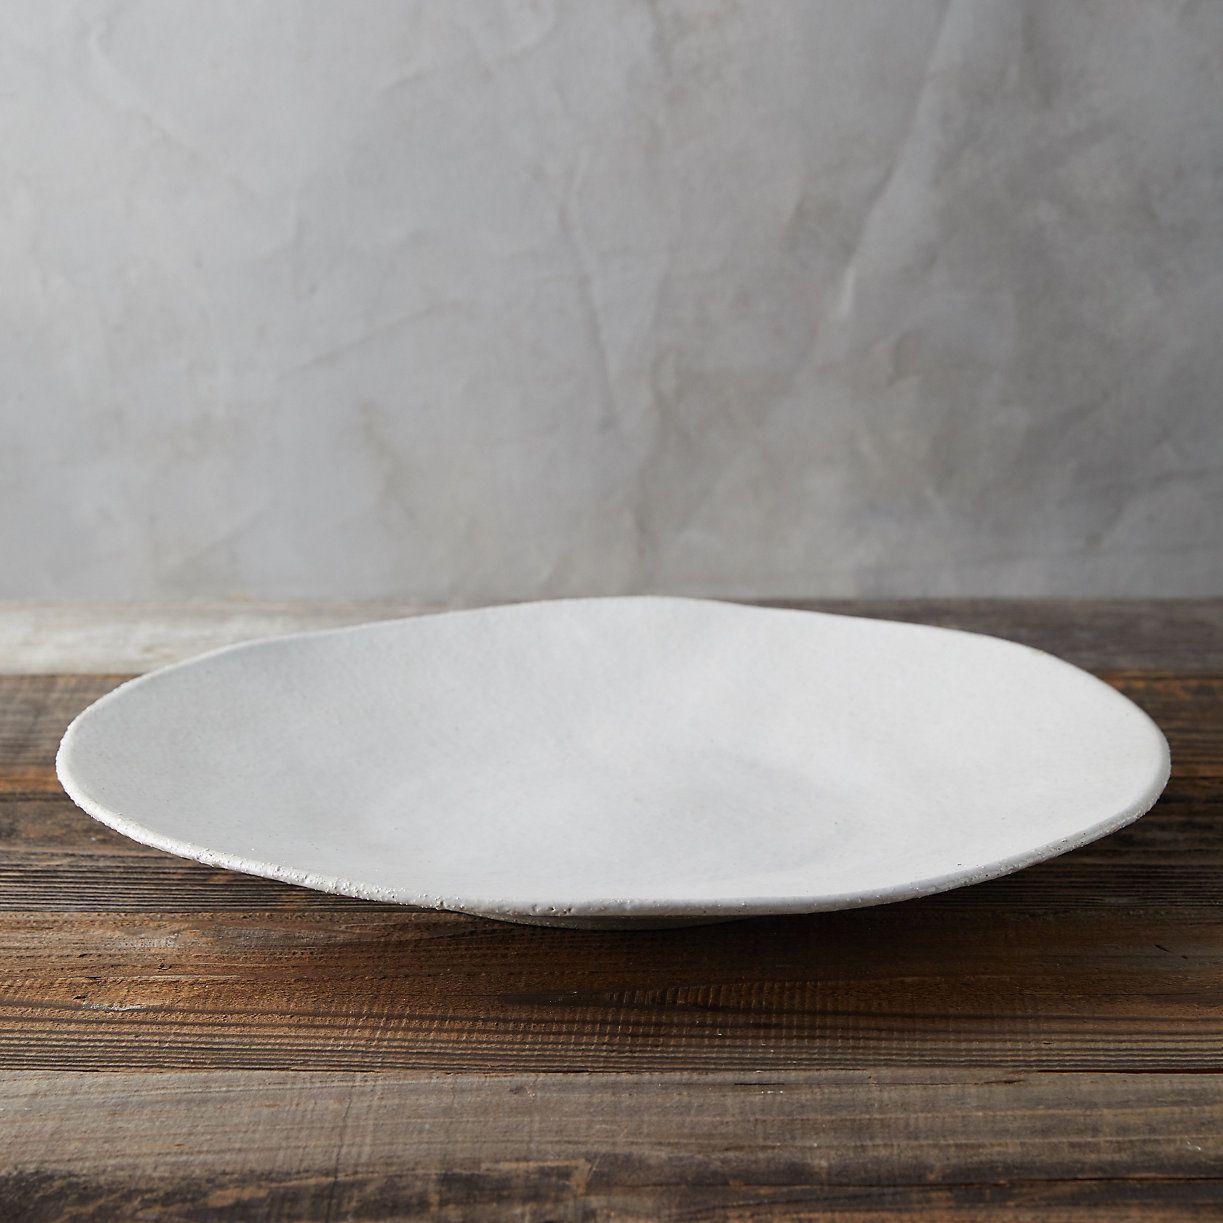 Raw Ceramic Serving Platter